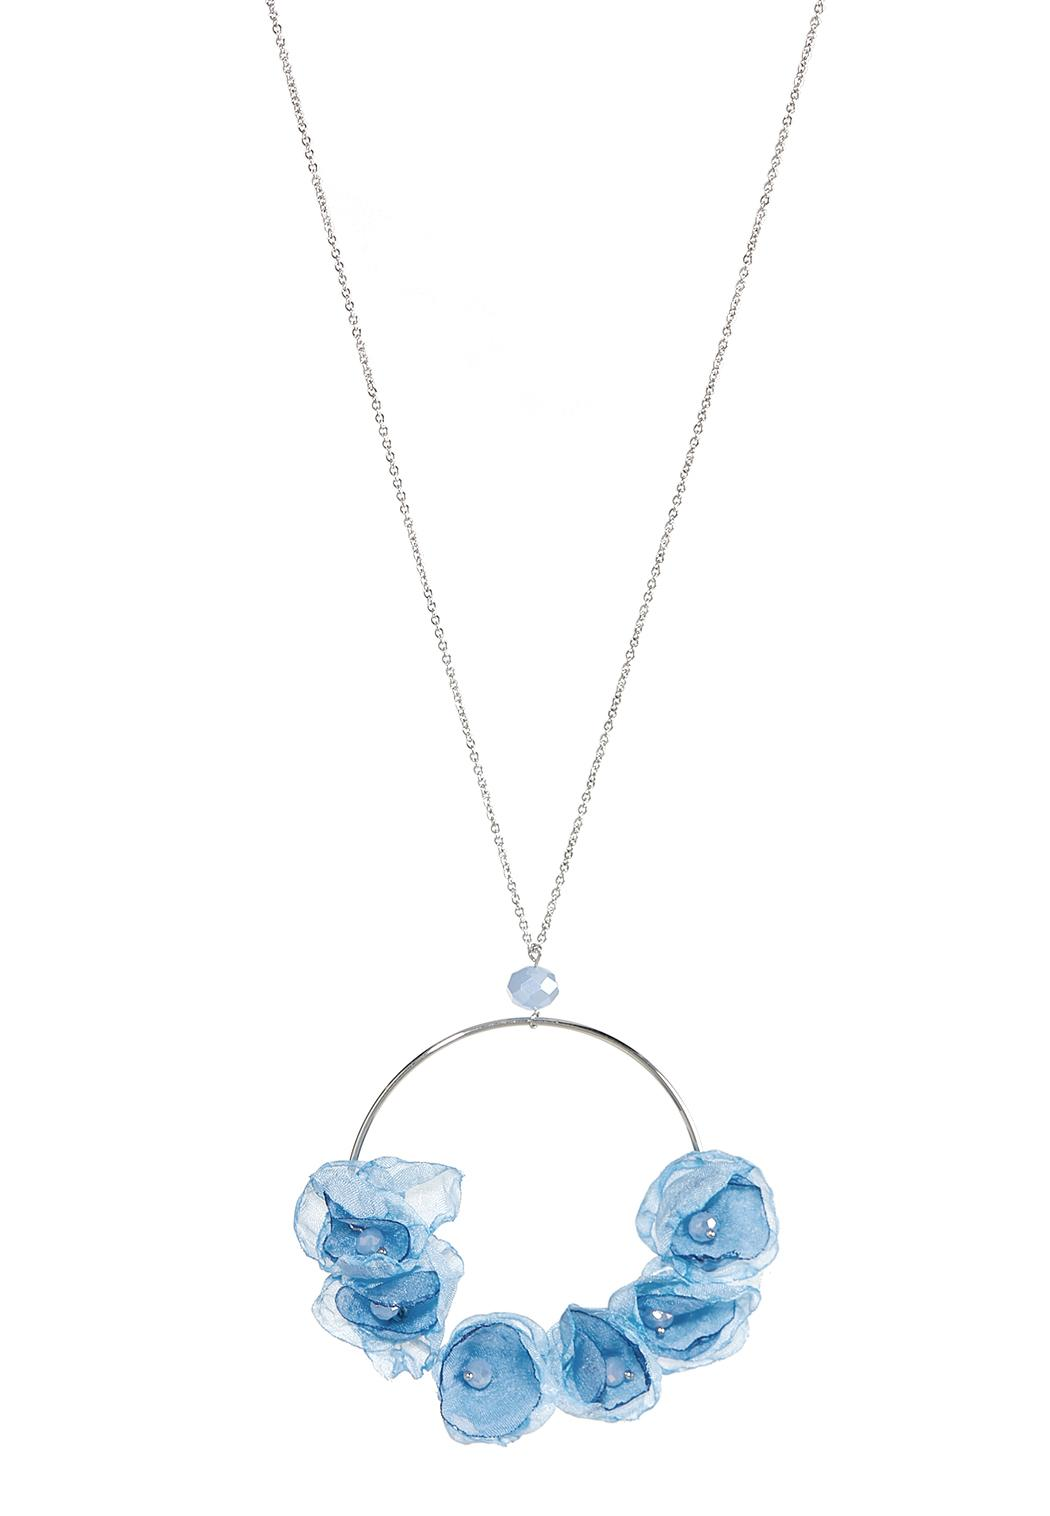 Chiffon Petal Pendant Necklace